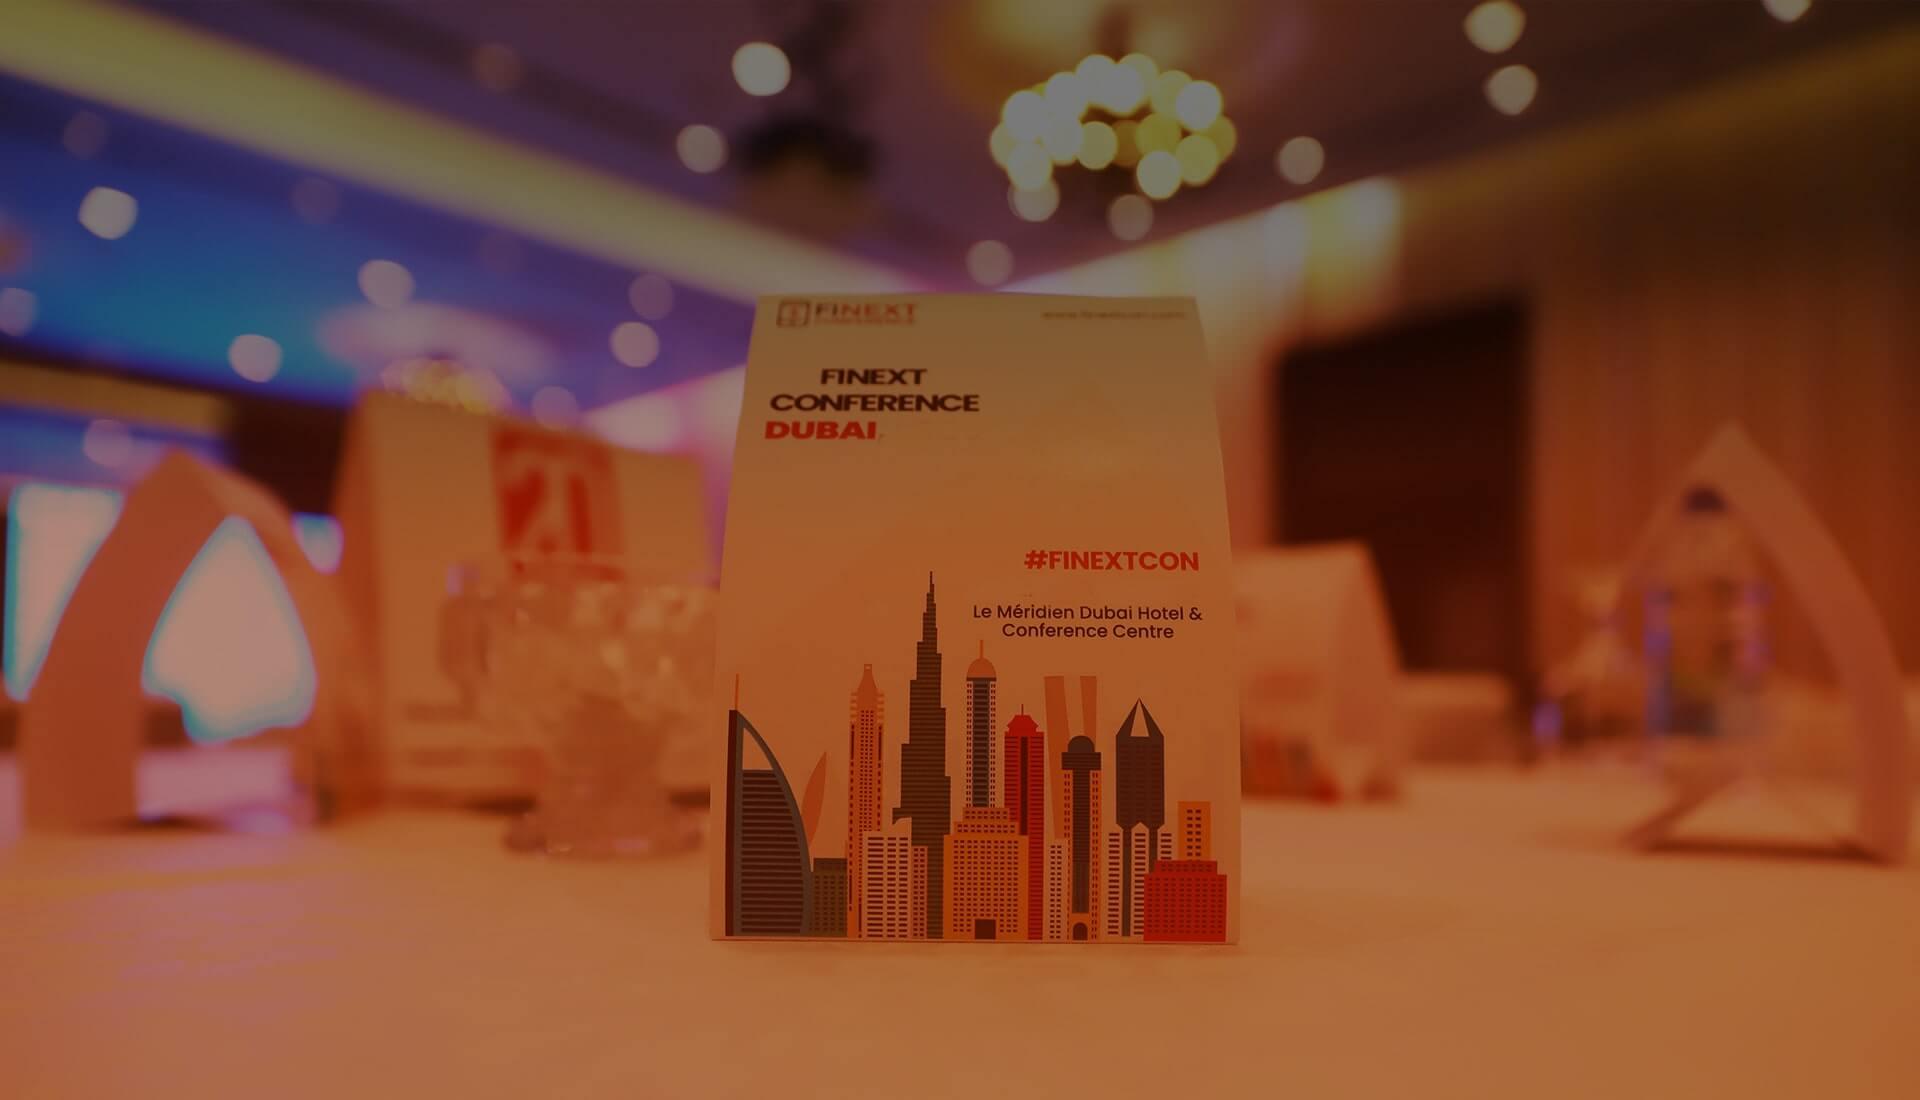 FiNext Conference Dubai<br>February 2 - 3, 2022